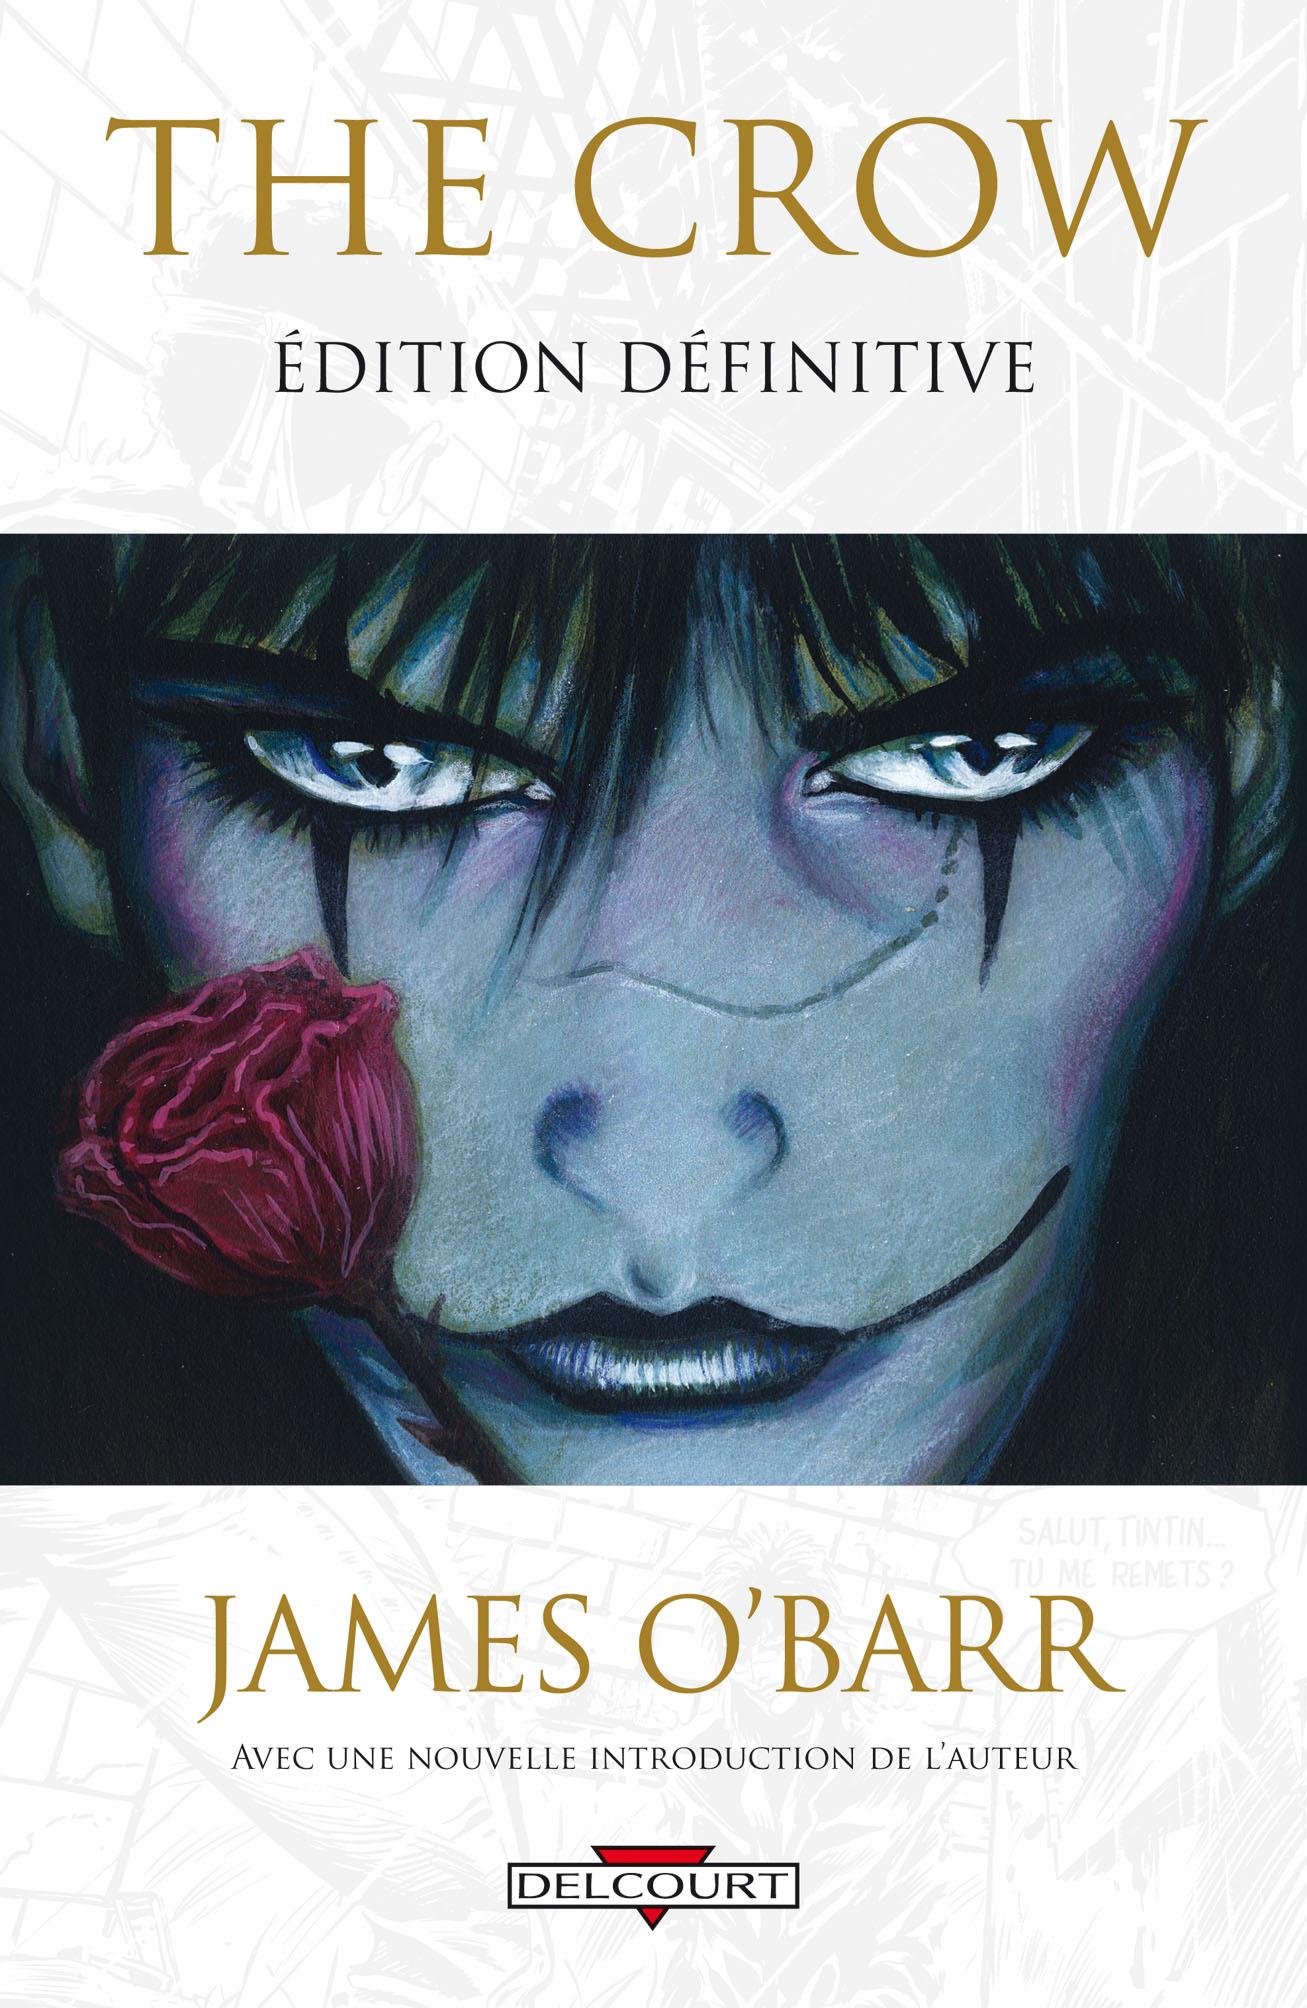 The Crow (O'Barr) 1 - The crow - Edition définitive